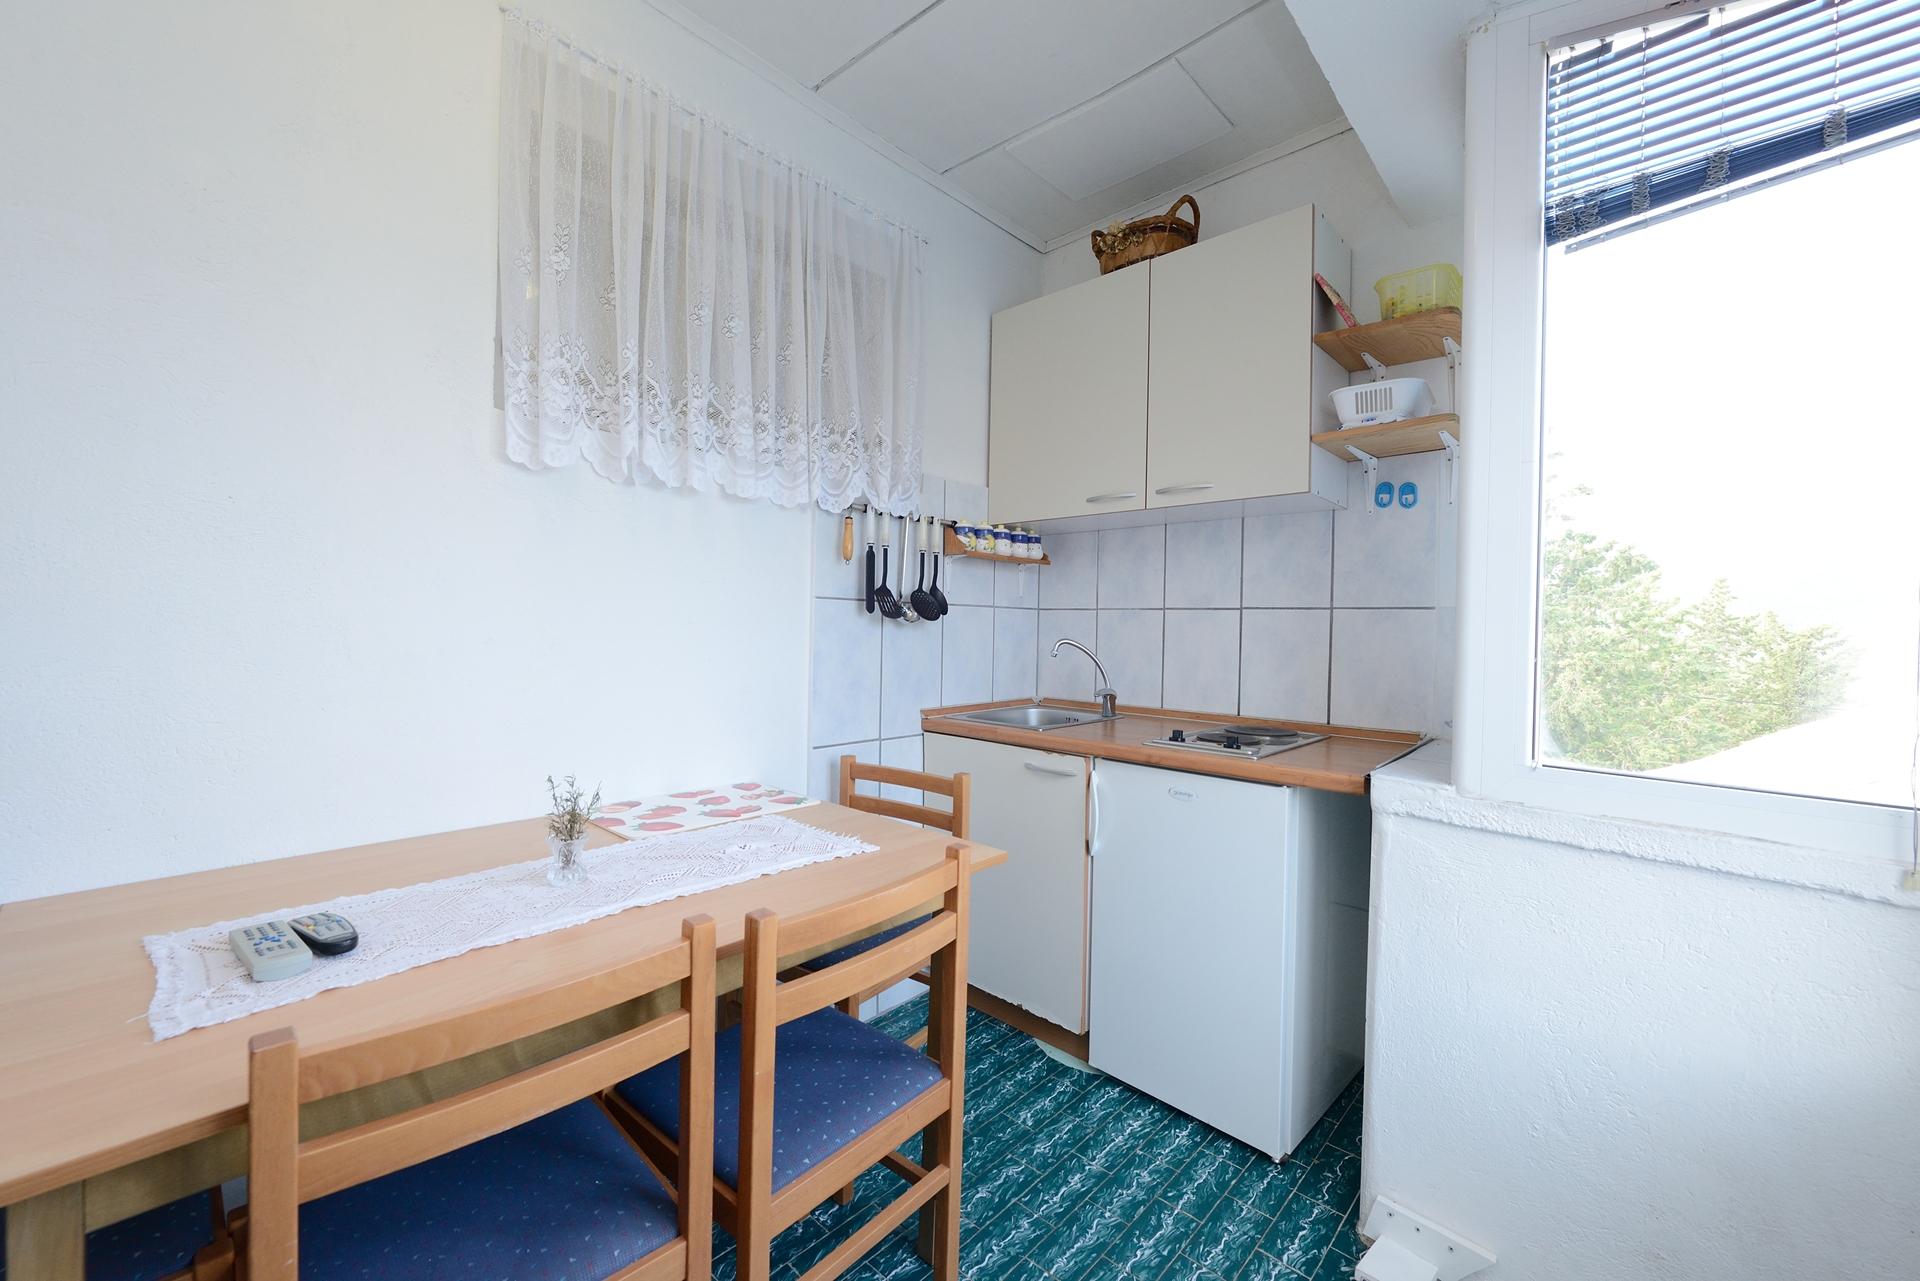 Martin - Lukoran - Vakantiehuizen, villa´s Kroatië - H(8): keuken en eetkamer